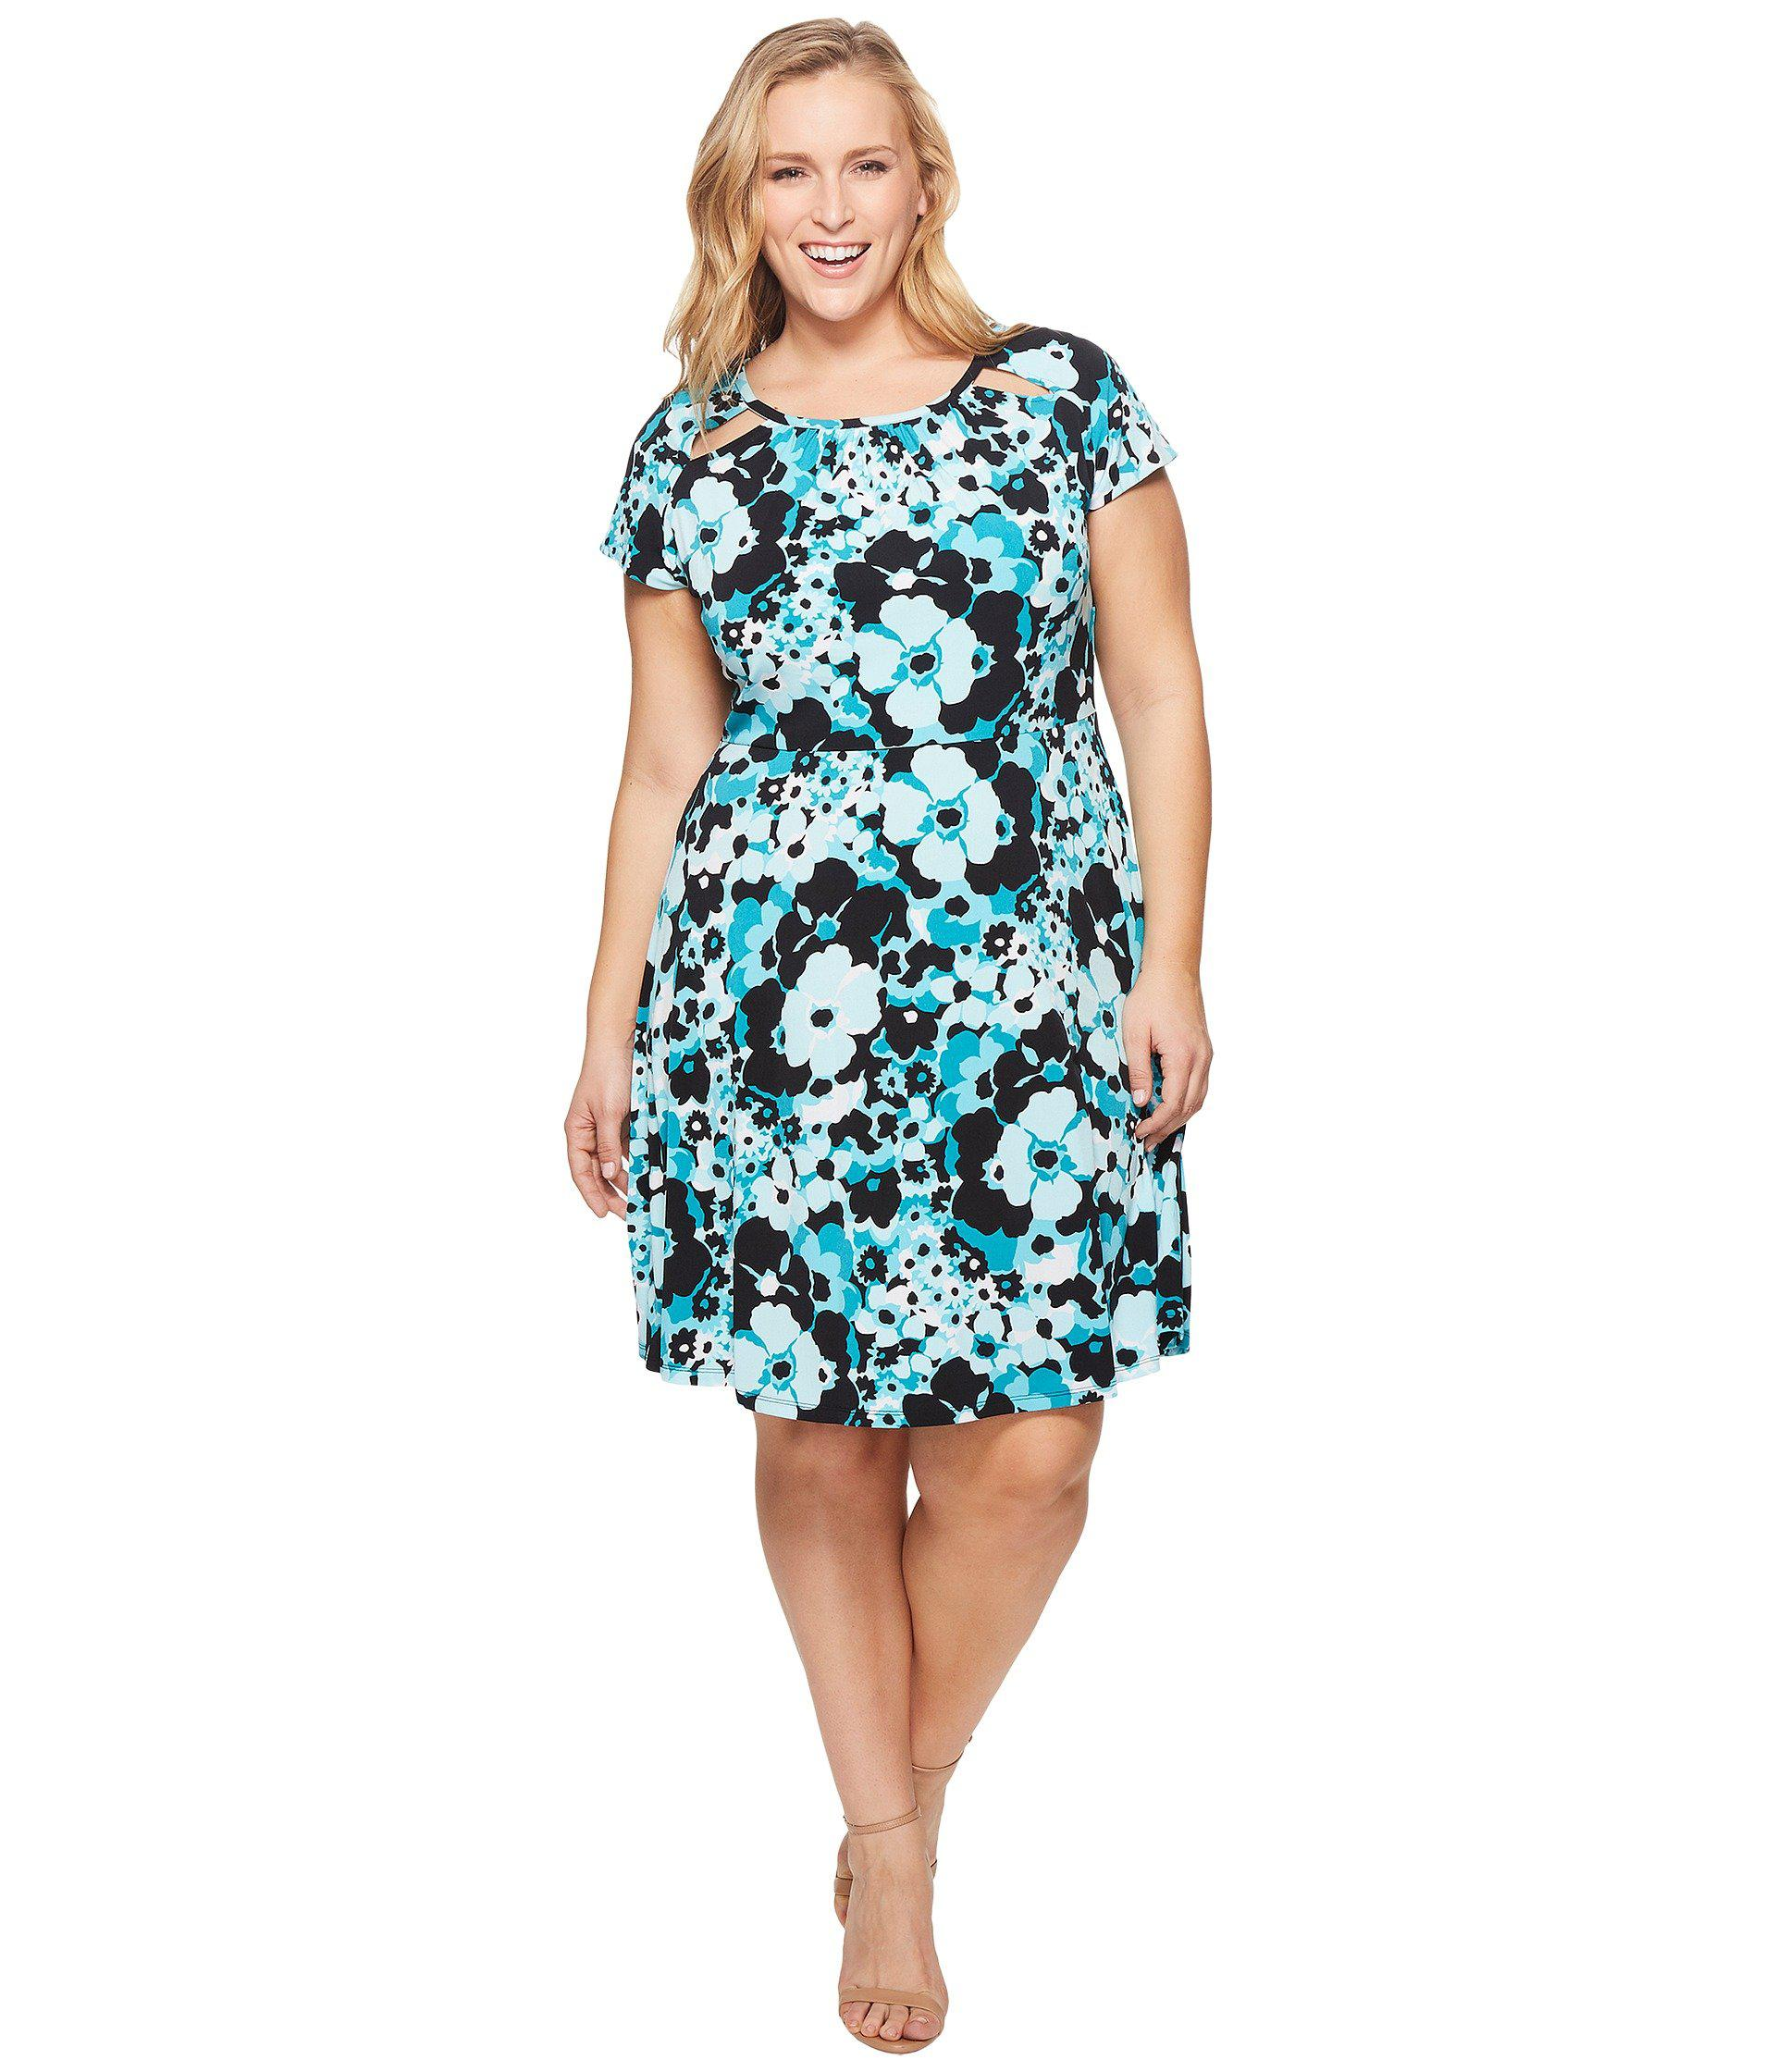 20ac2ad473925 Lyst - MICHAEL Michael Kors Plus Size Springtime Floral Dress in ...